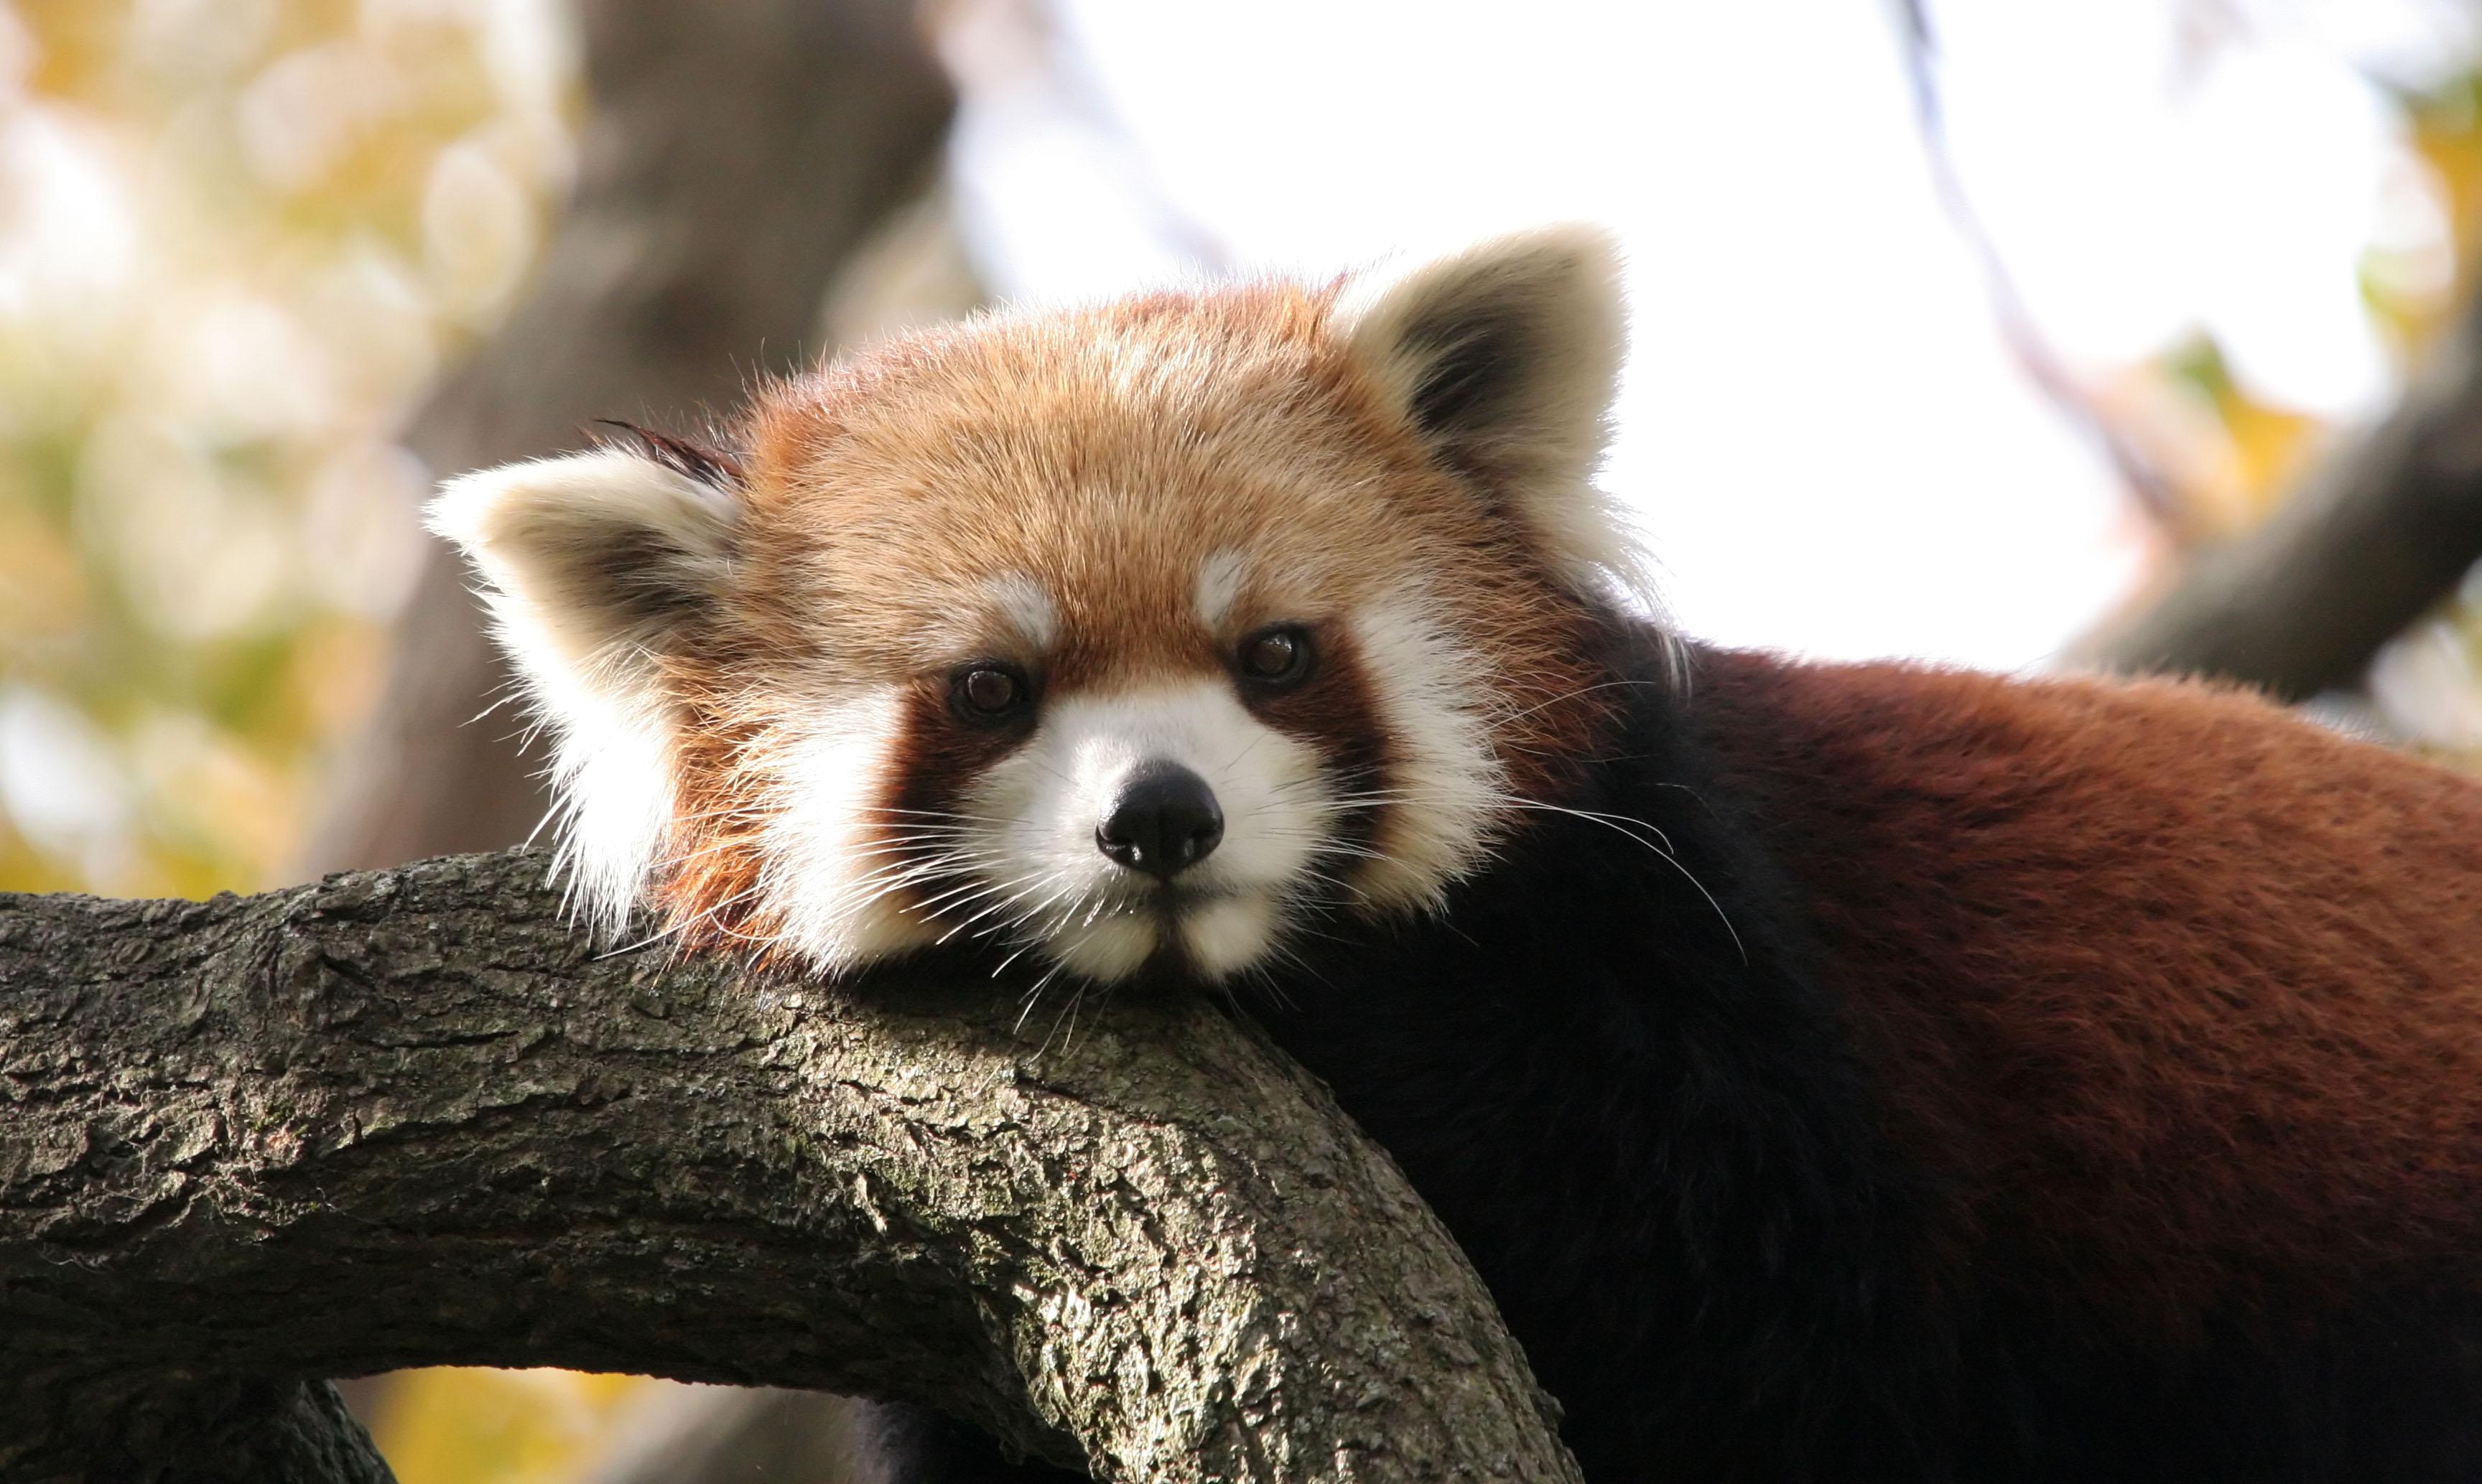 Related Pictures animal panda wallpaper desktop backgrounds 3456x2067